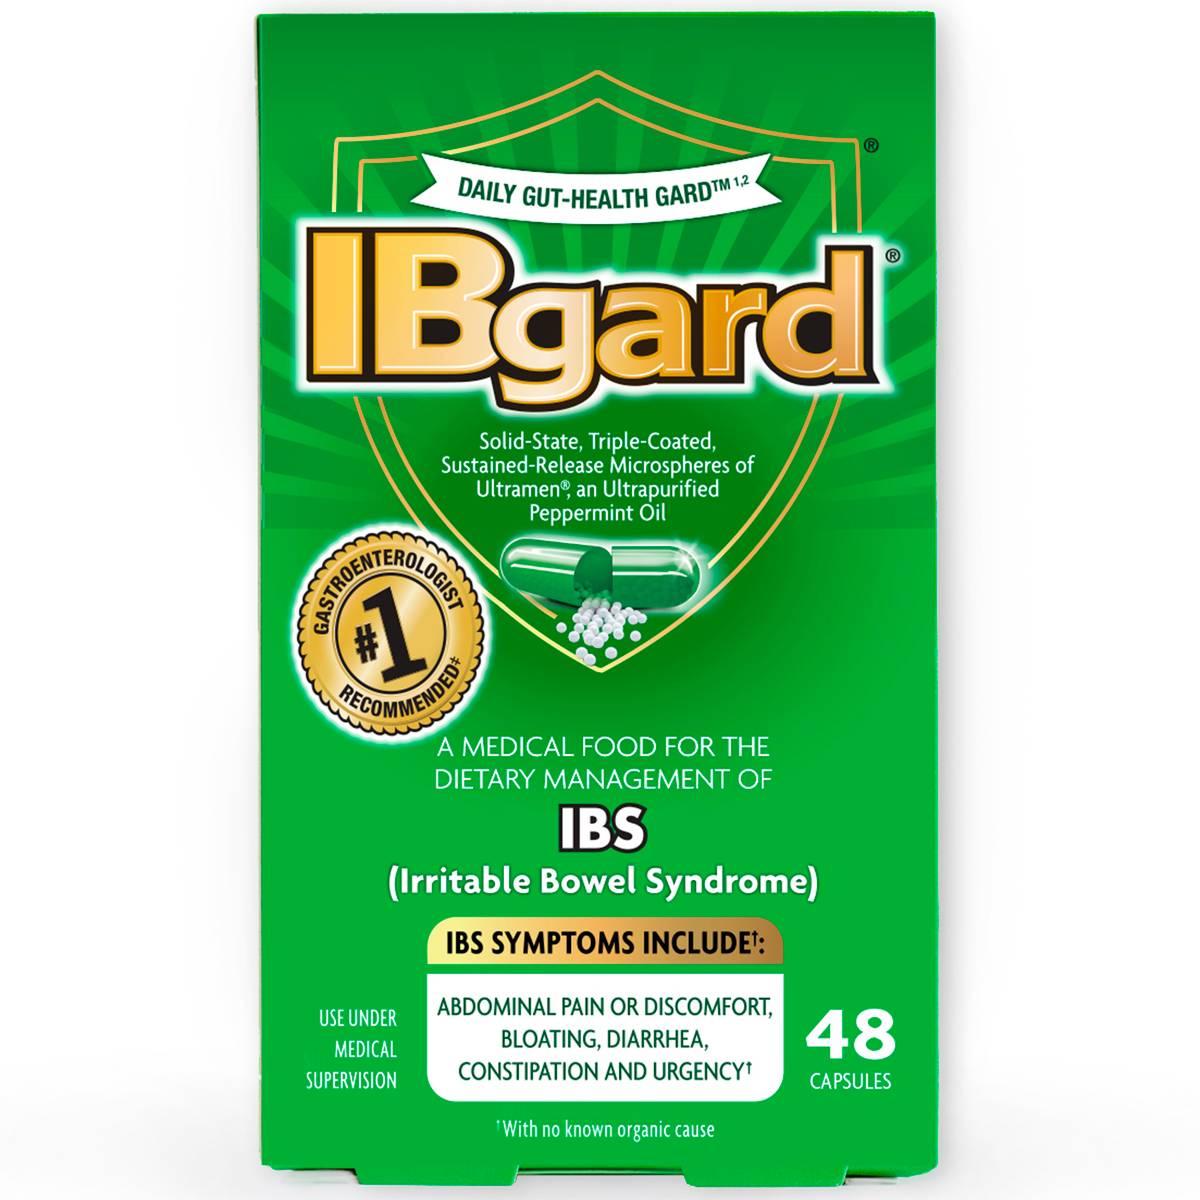 IBgard 48 capsules product